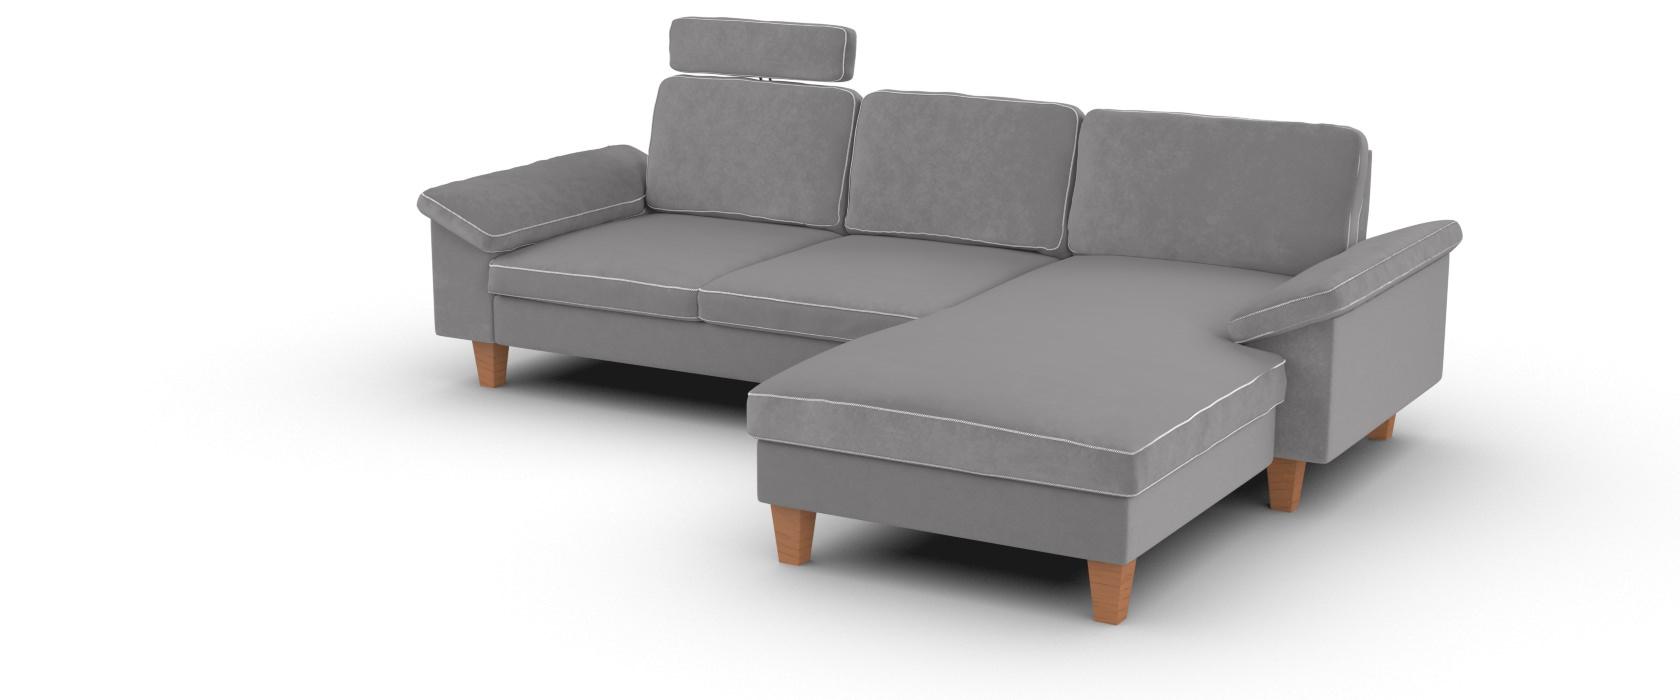 Sofa mit Chaiselongue Como